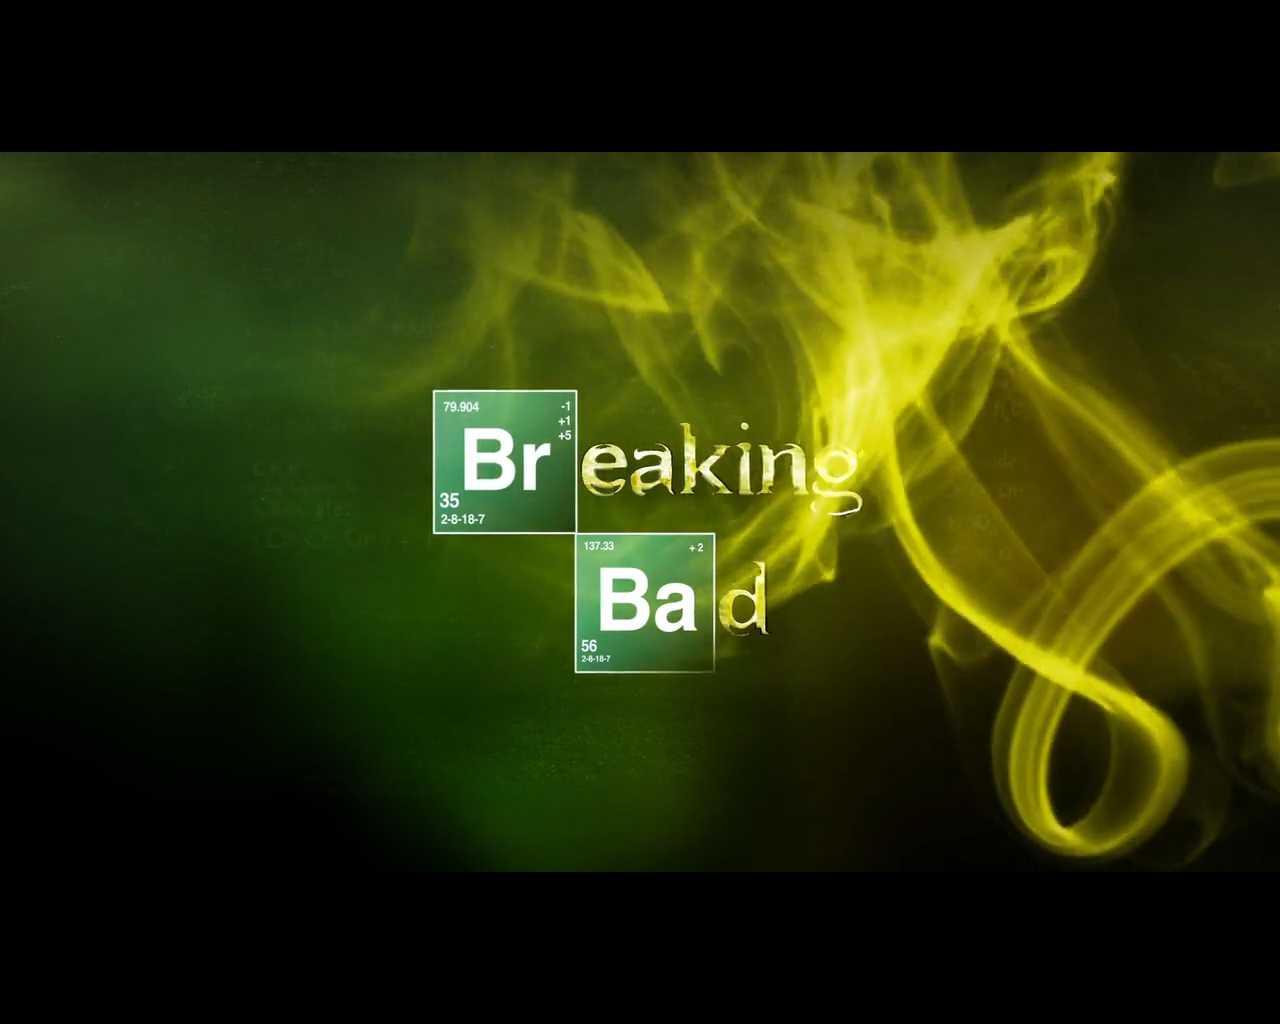 Full Hd P Breaking Bad Wallpapers Hd Desktop Backgrounds 1280x1024